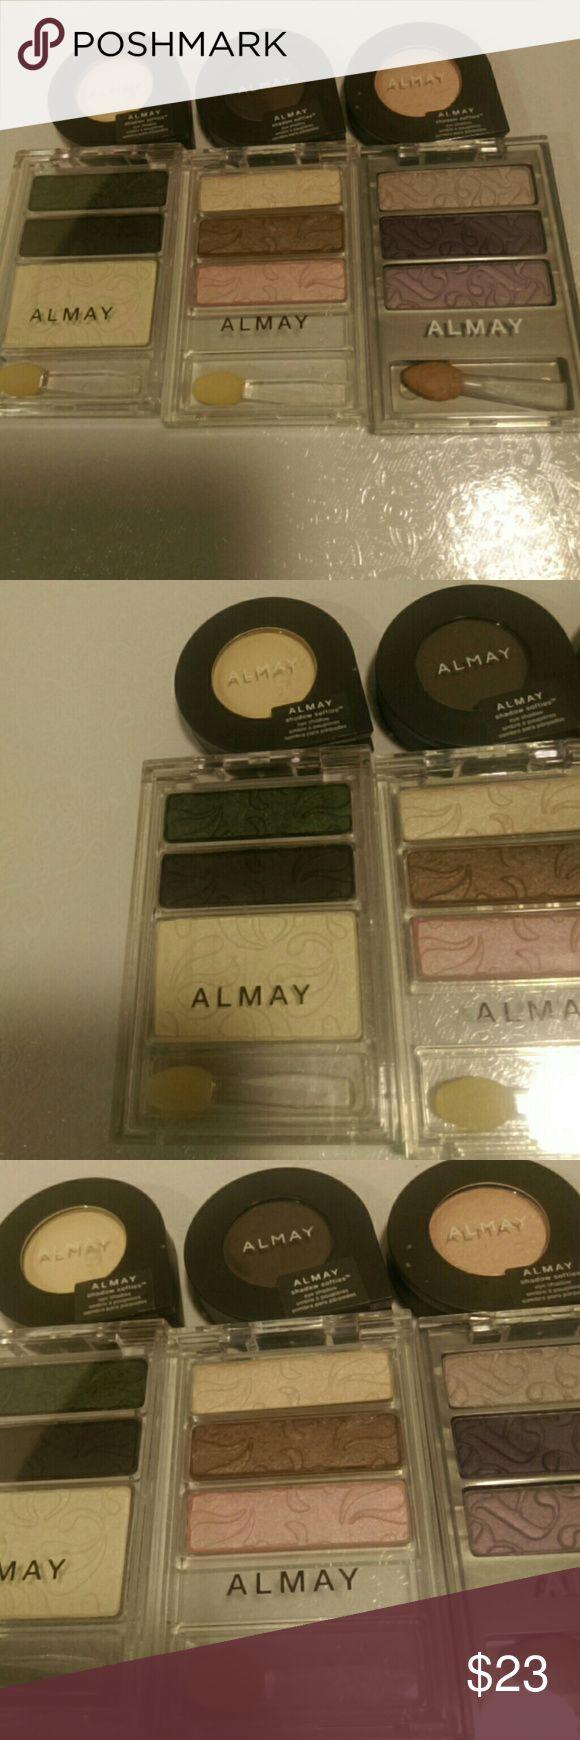 Almay Eyeshadow New. Eyeshadow 155 Cashmere, 150 Smoke, 125 Creme Brulee I-color trio Almay Makeup